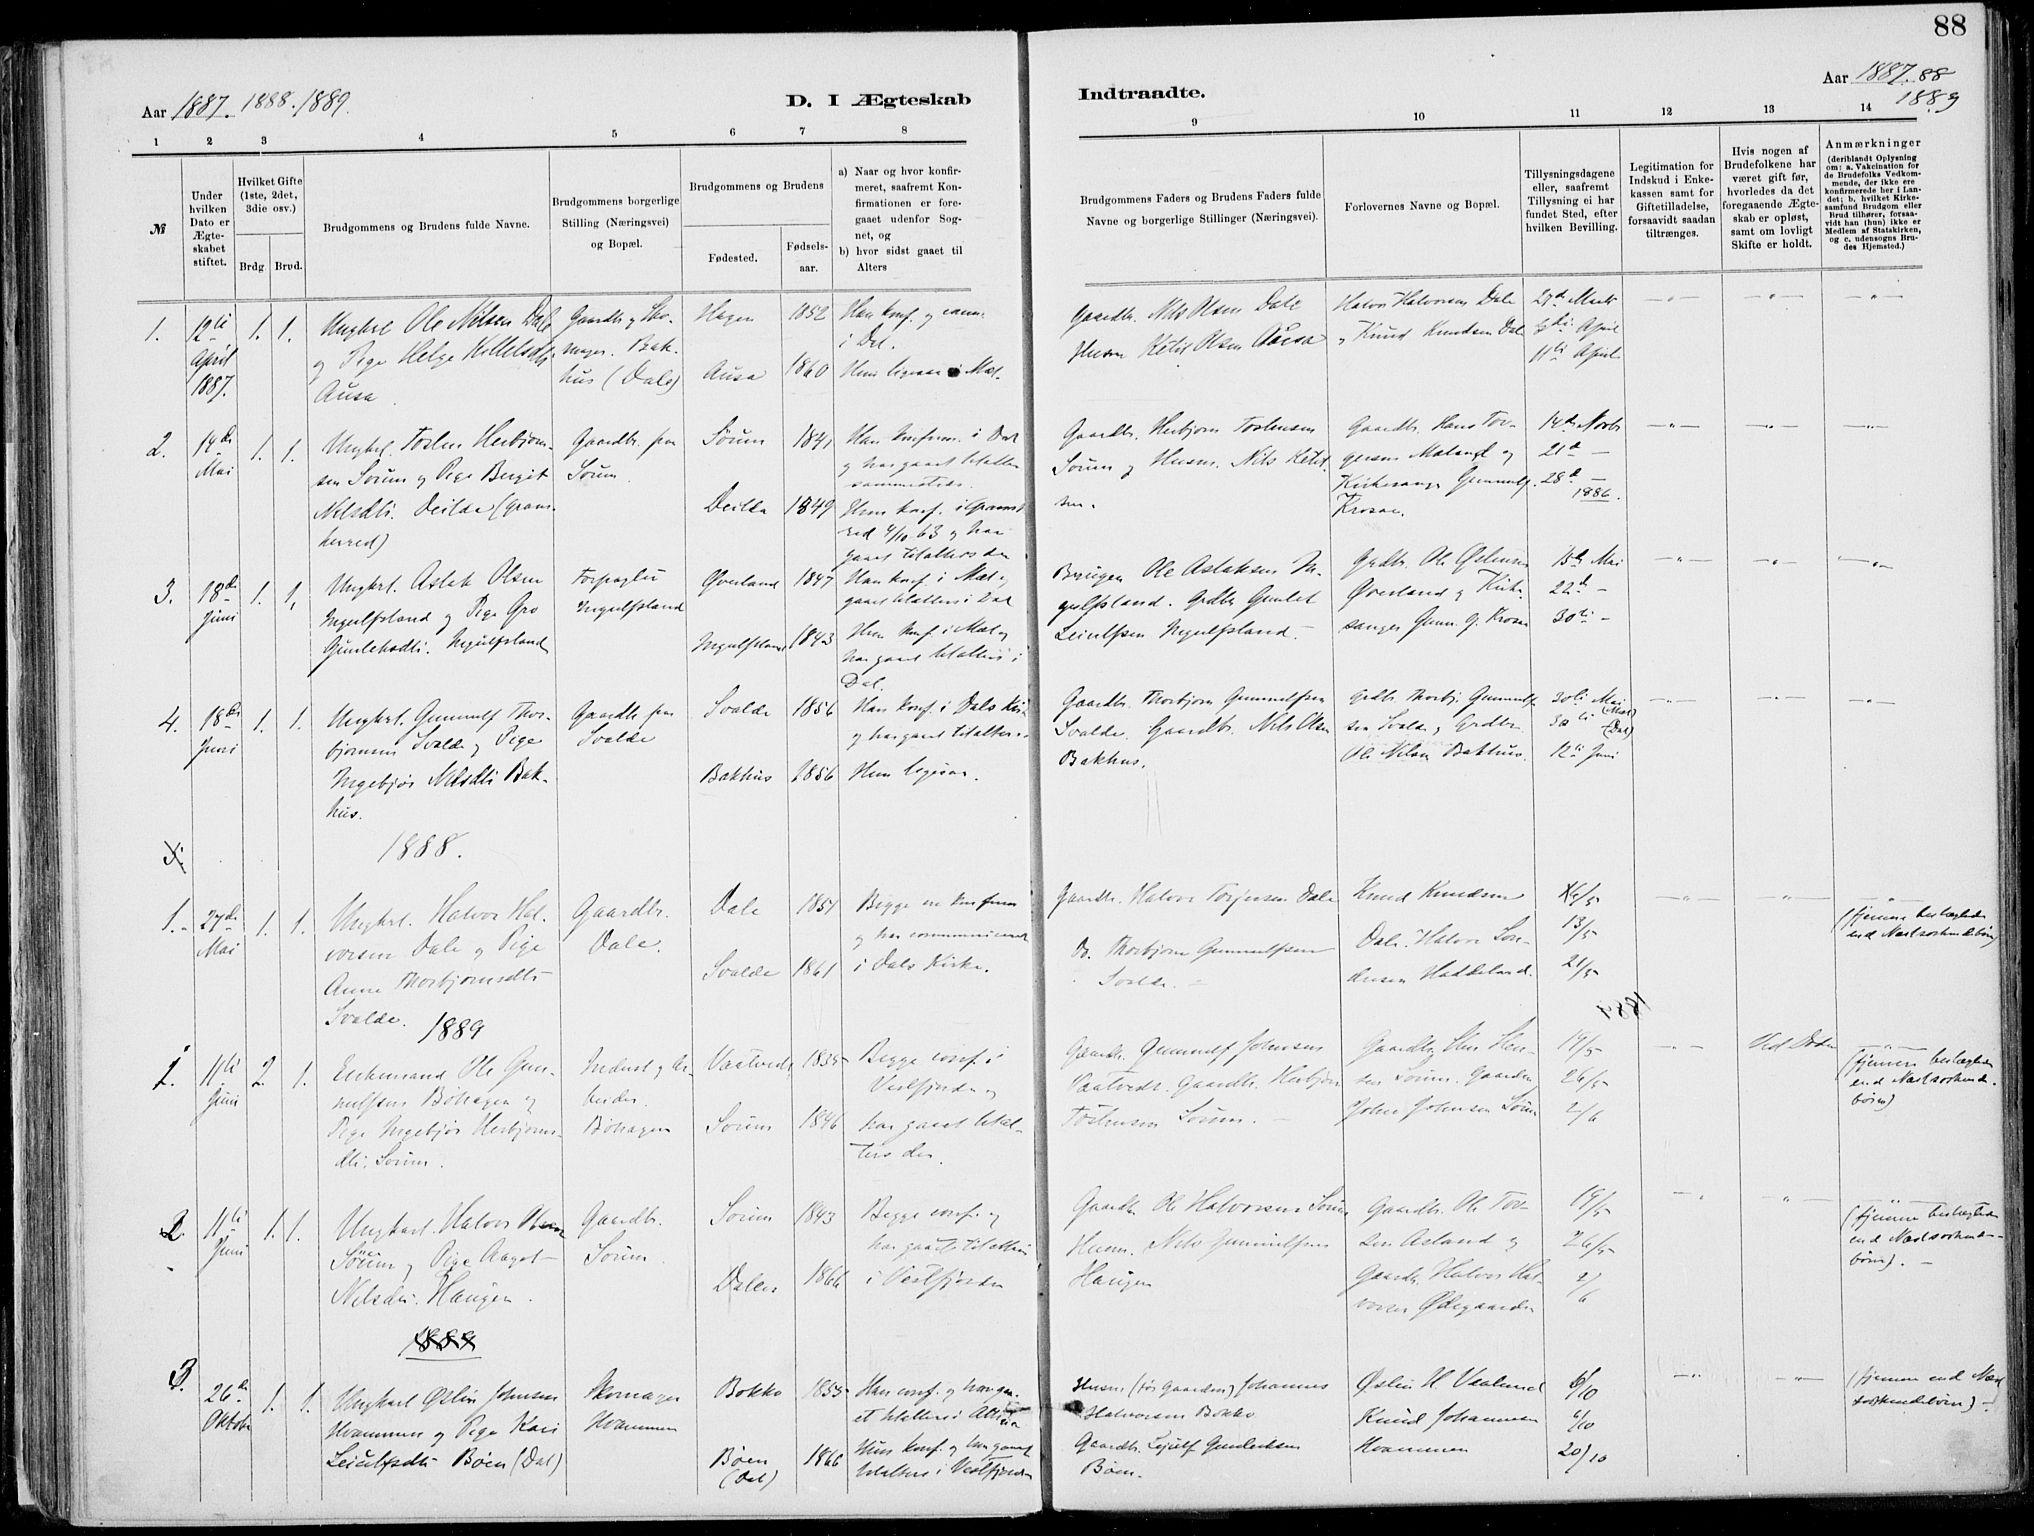 SAKO, Rjukan kirkebøker, F/Fa/L0001: Ministerialbok nr. 1, 1878-1912, s. 88